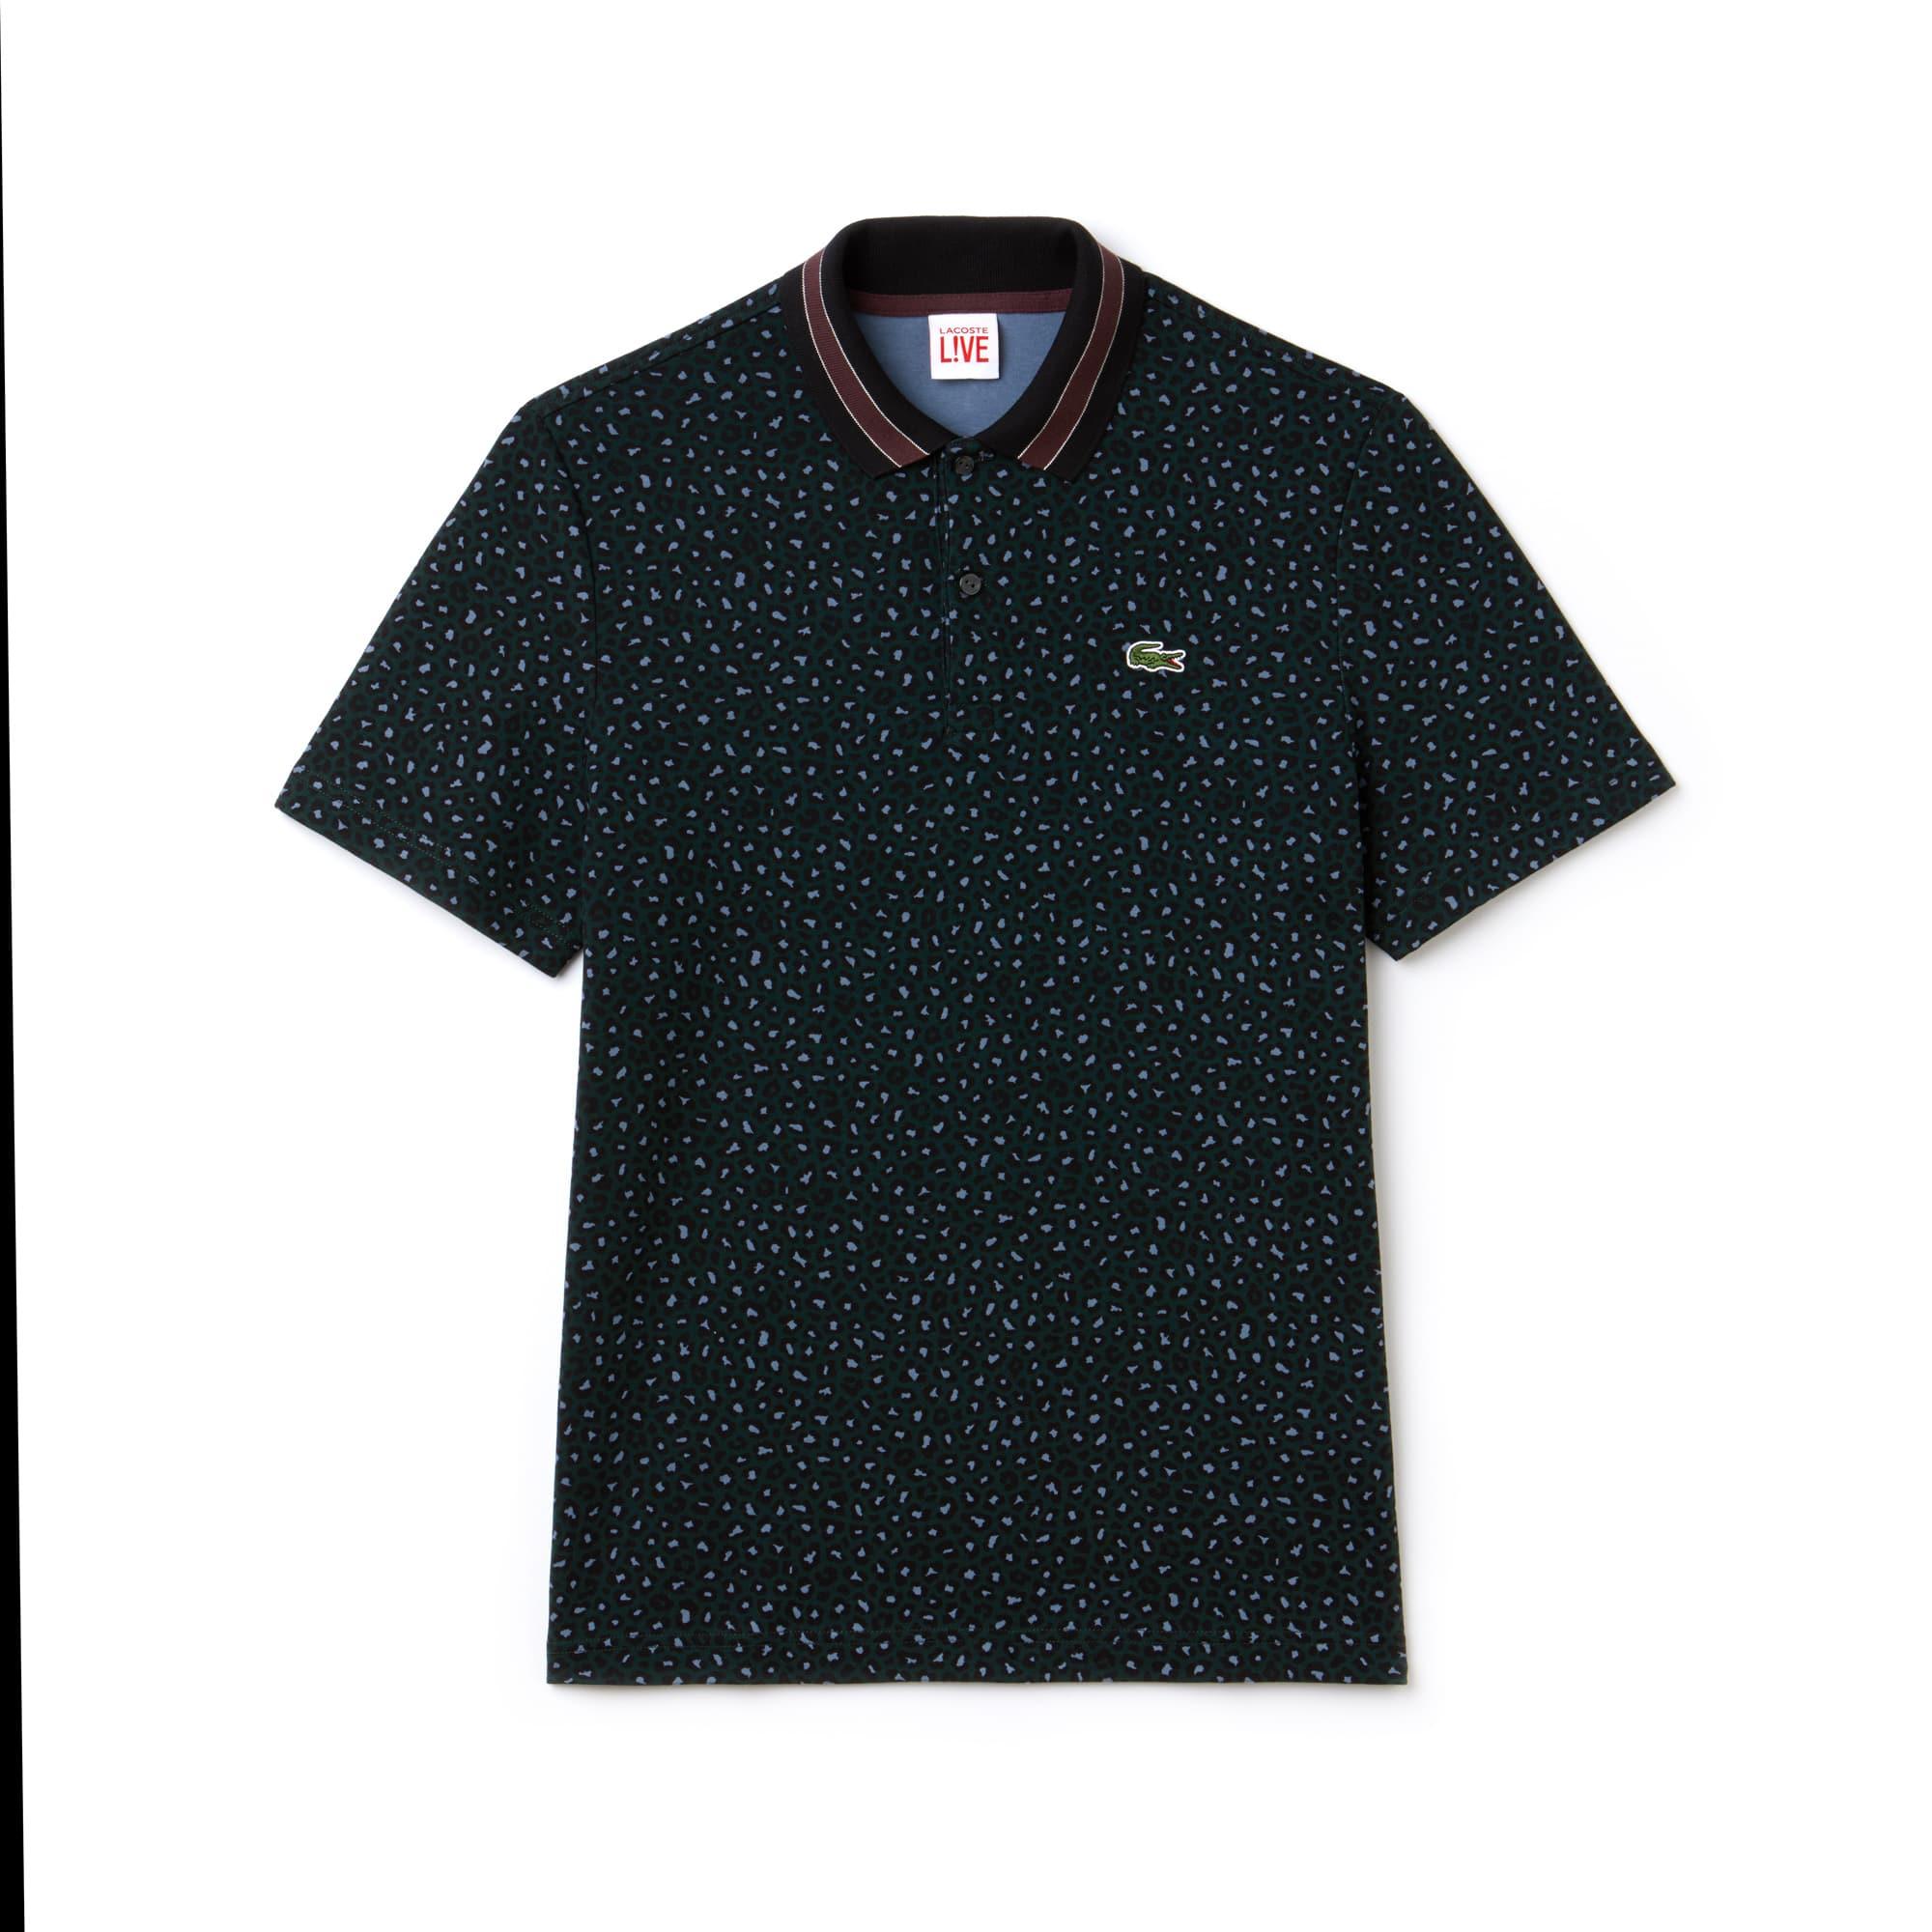 Men's Lacoste LIVE Regular Fit Leopard Print Interlock Polo